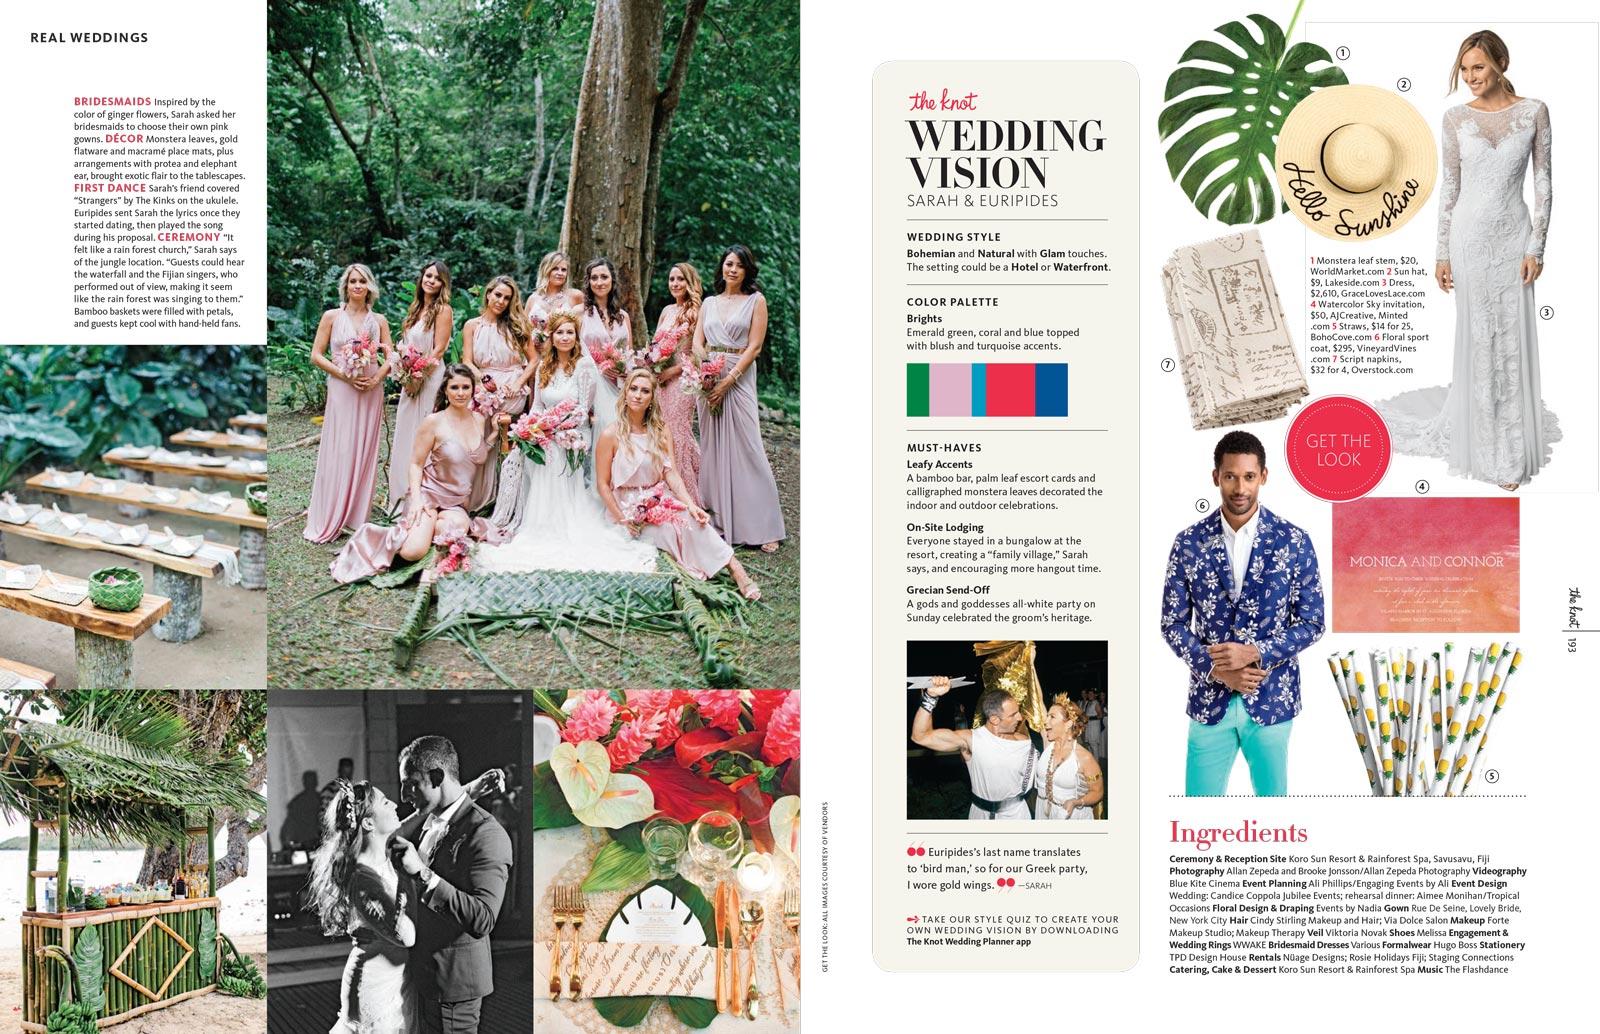 Fiji-Destination-Wedding-the-Knot.jpg